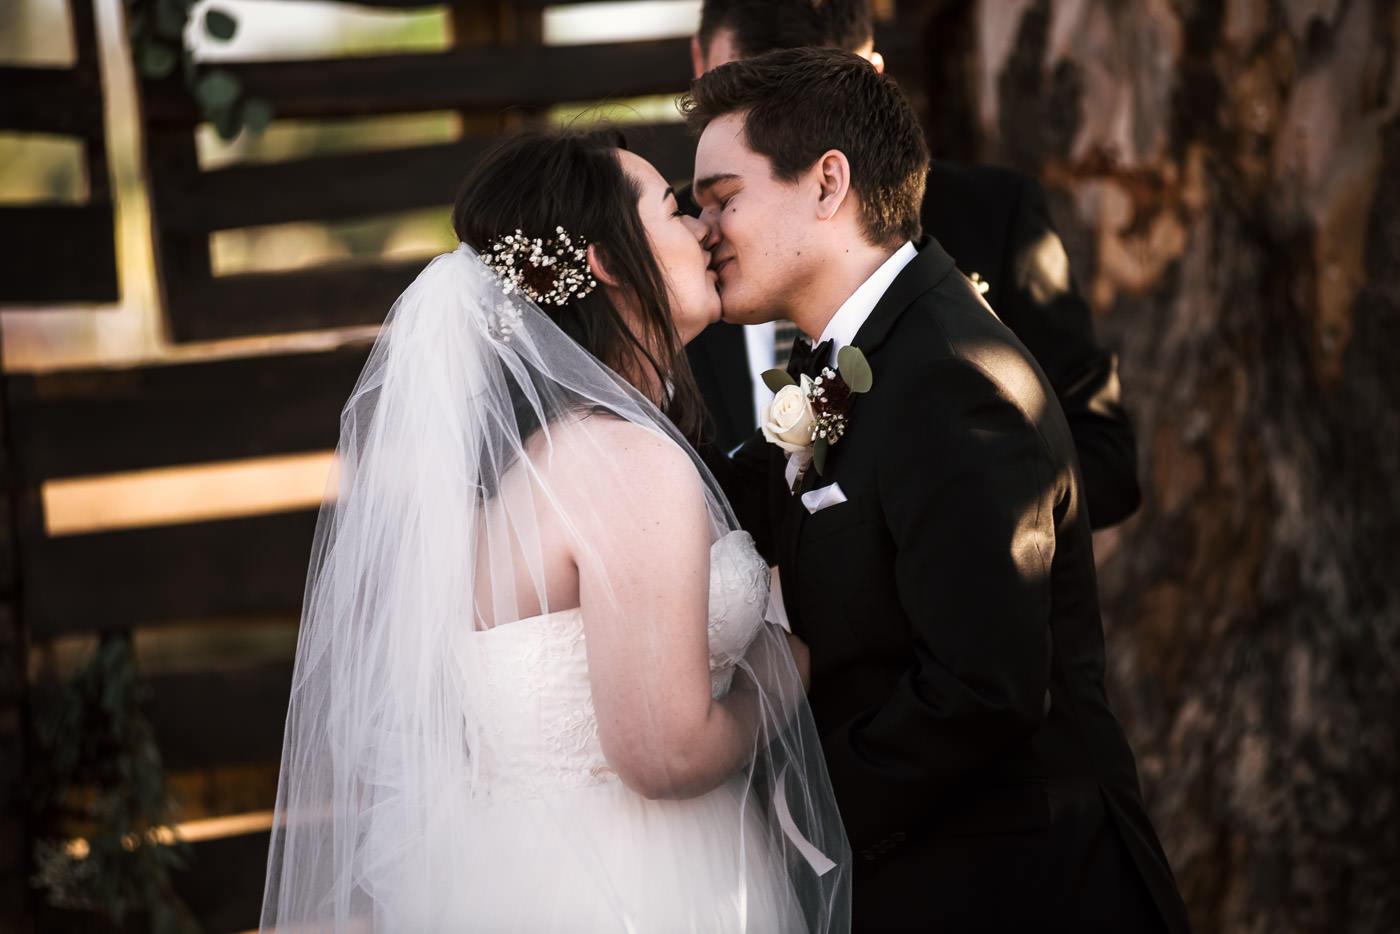 First kiss at romantic country wedding Temecula California.